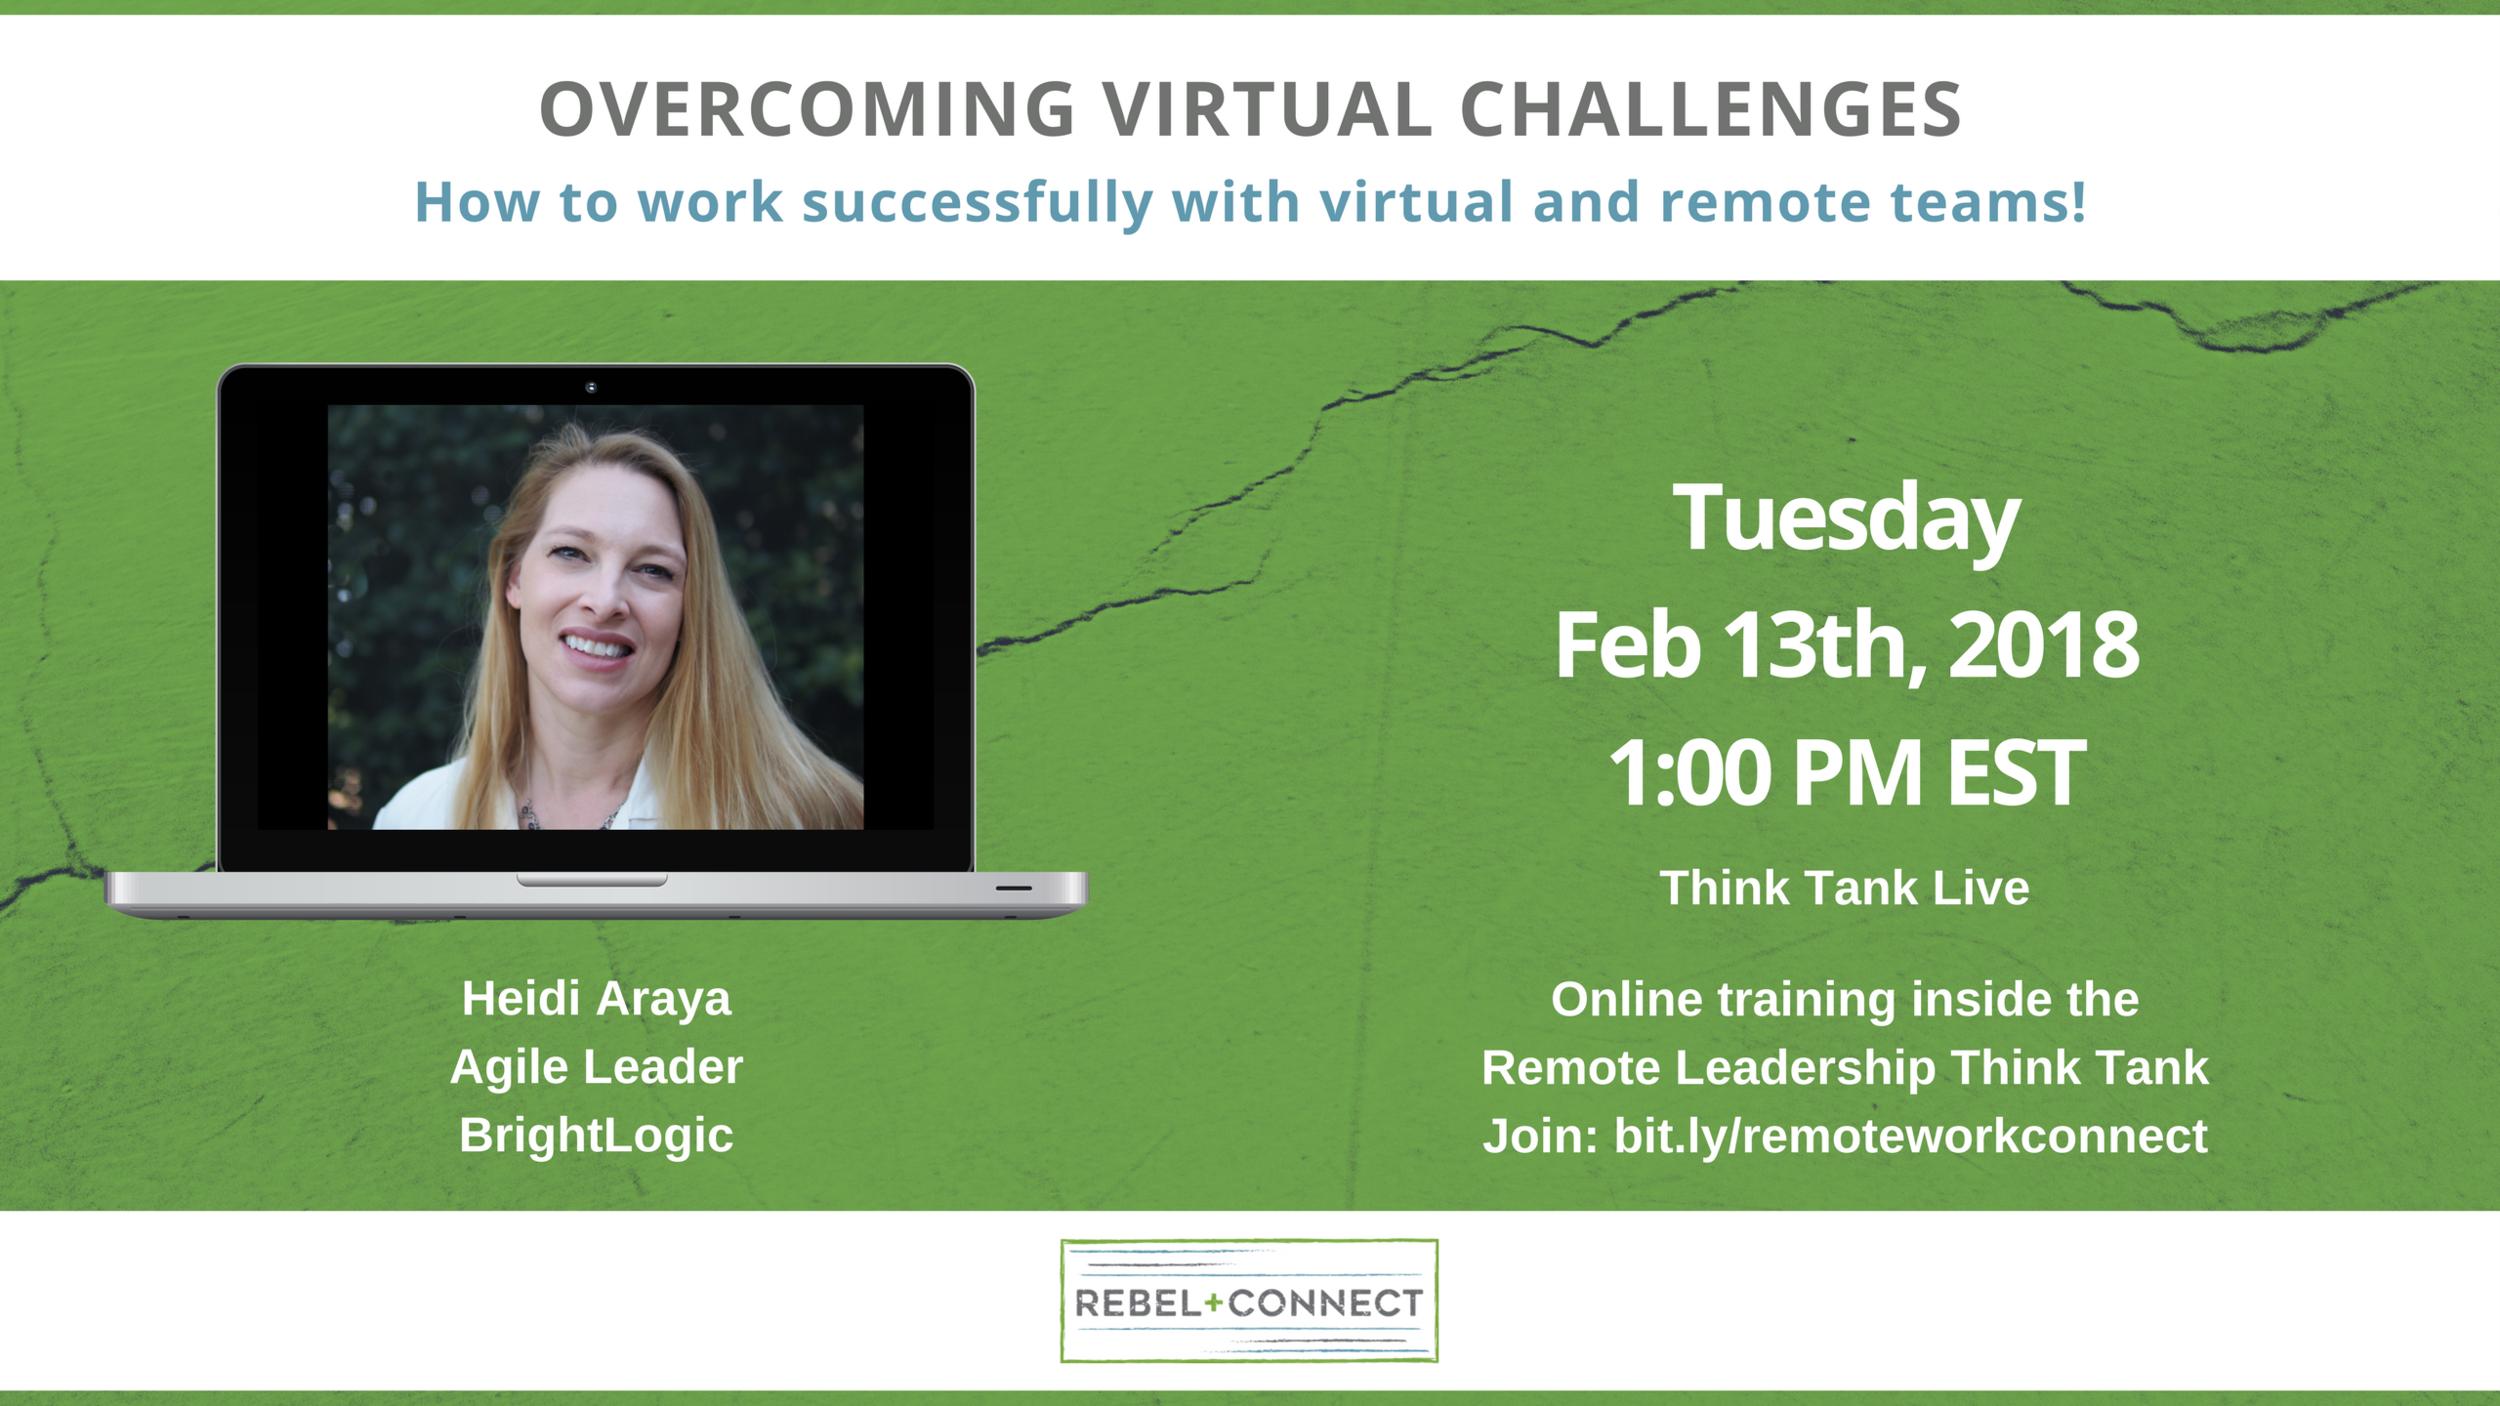 Leading virtual teams with Heidi Ayara